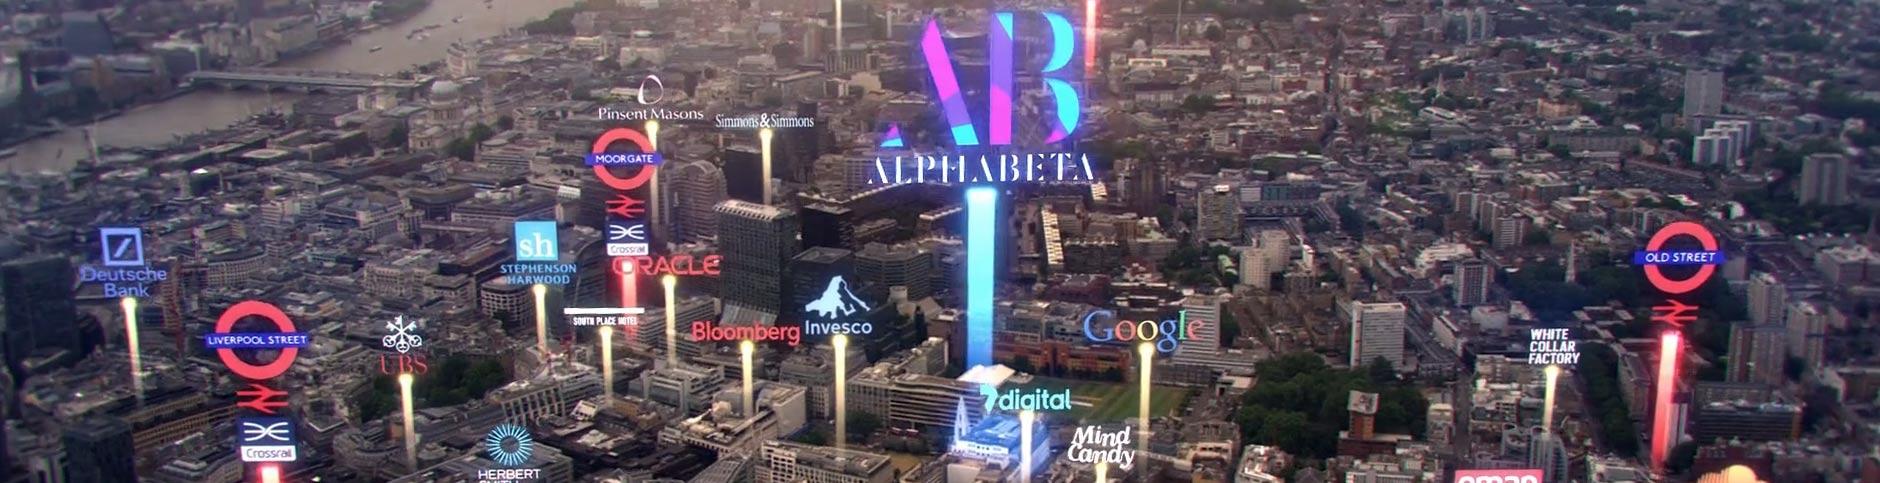 AlphaBeta---Property-Marketing-Video.mp4_snapshot_00.51_[2017.10.25_10.59.07]2